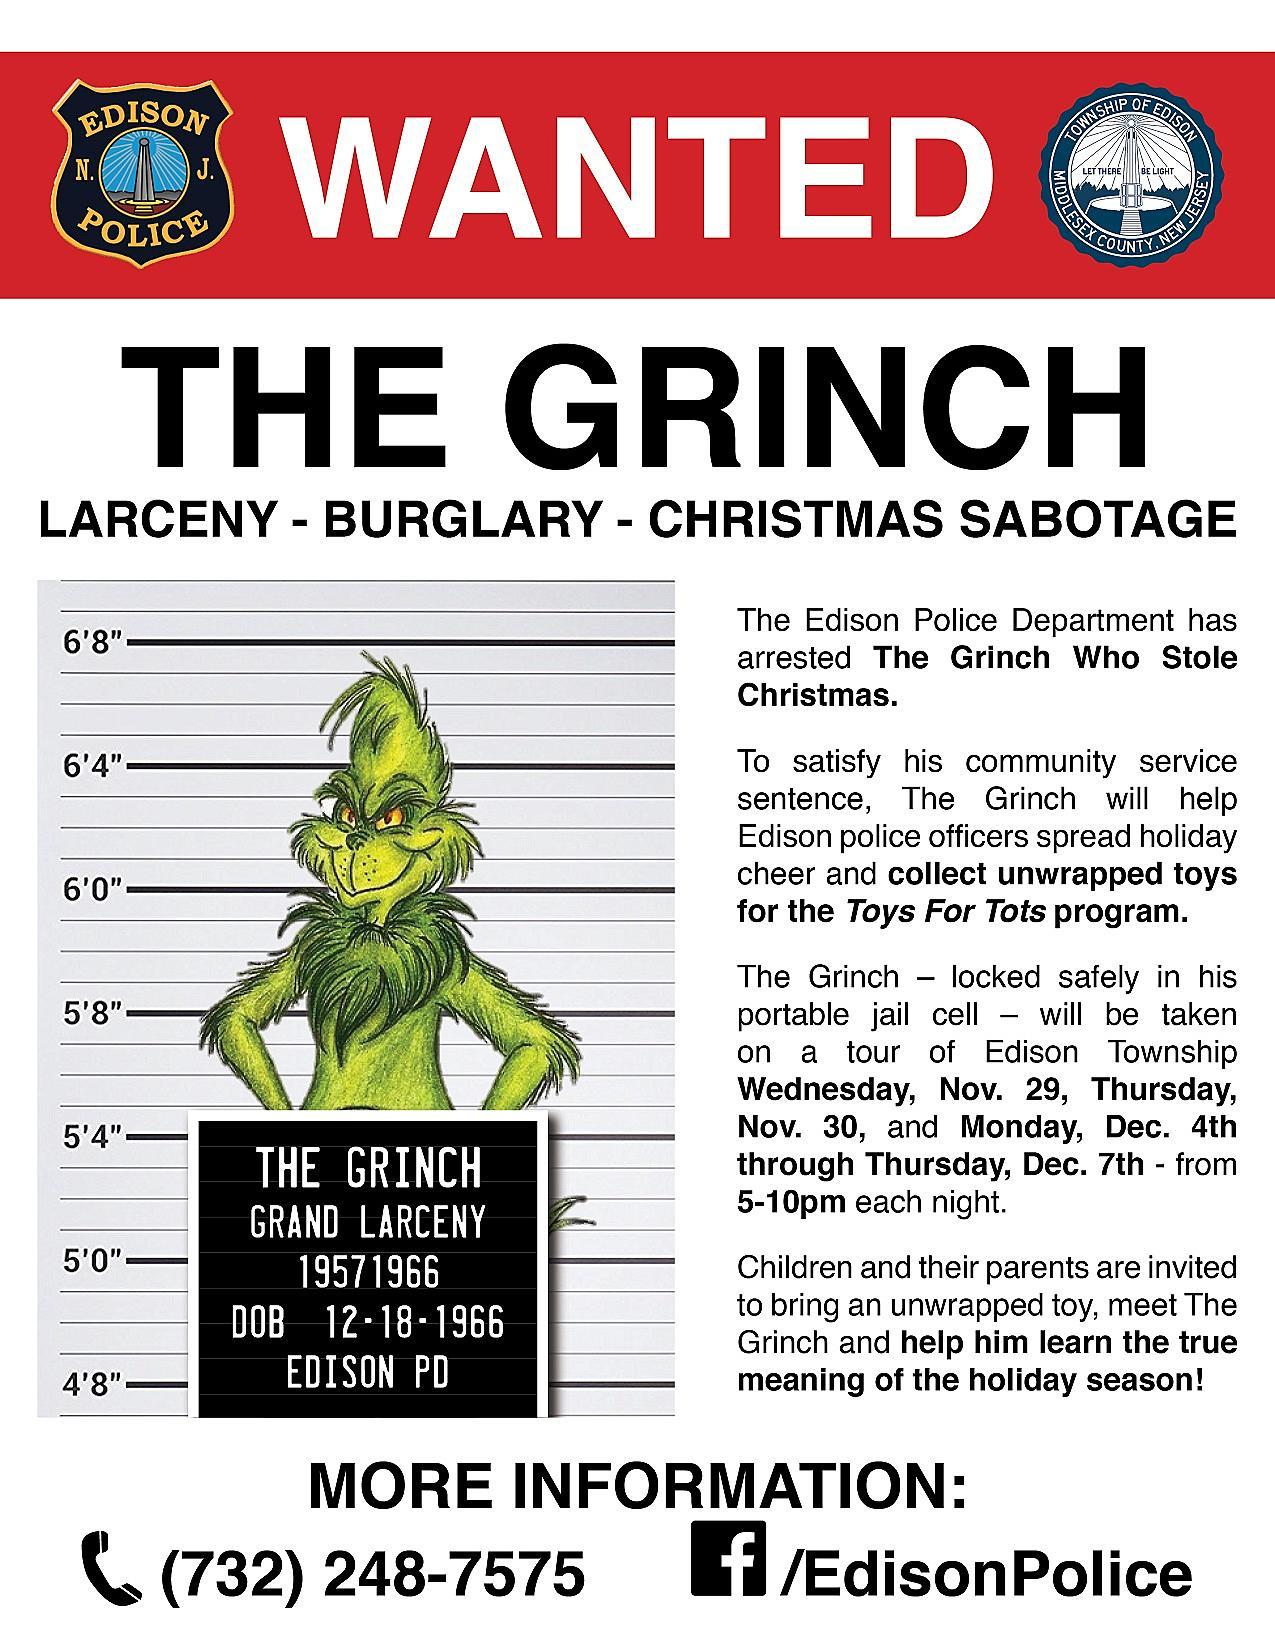 Grinch arrest in Edison caught on video